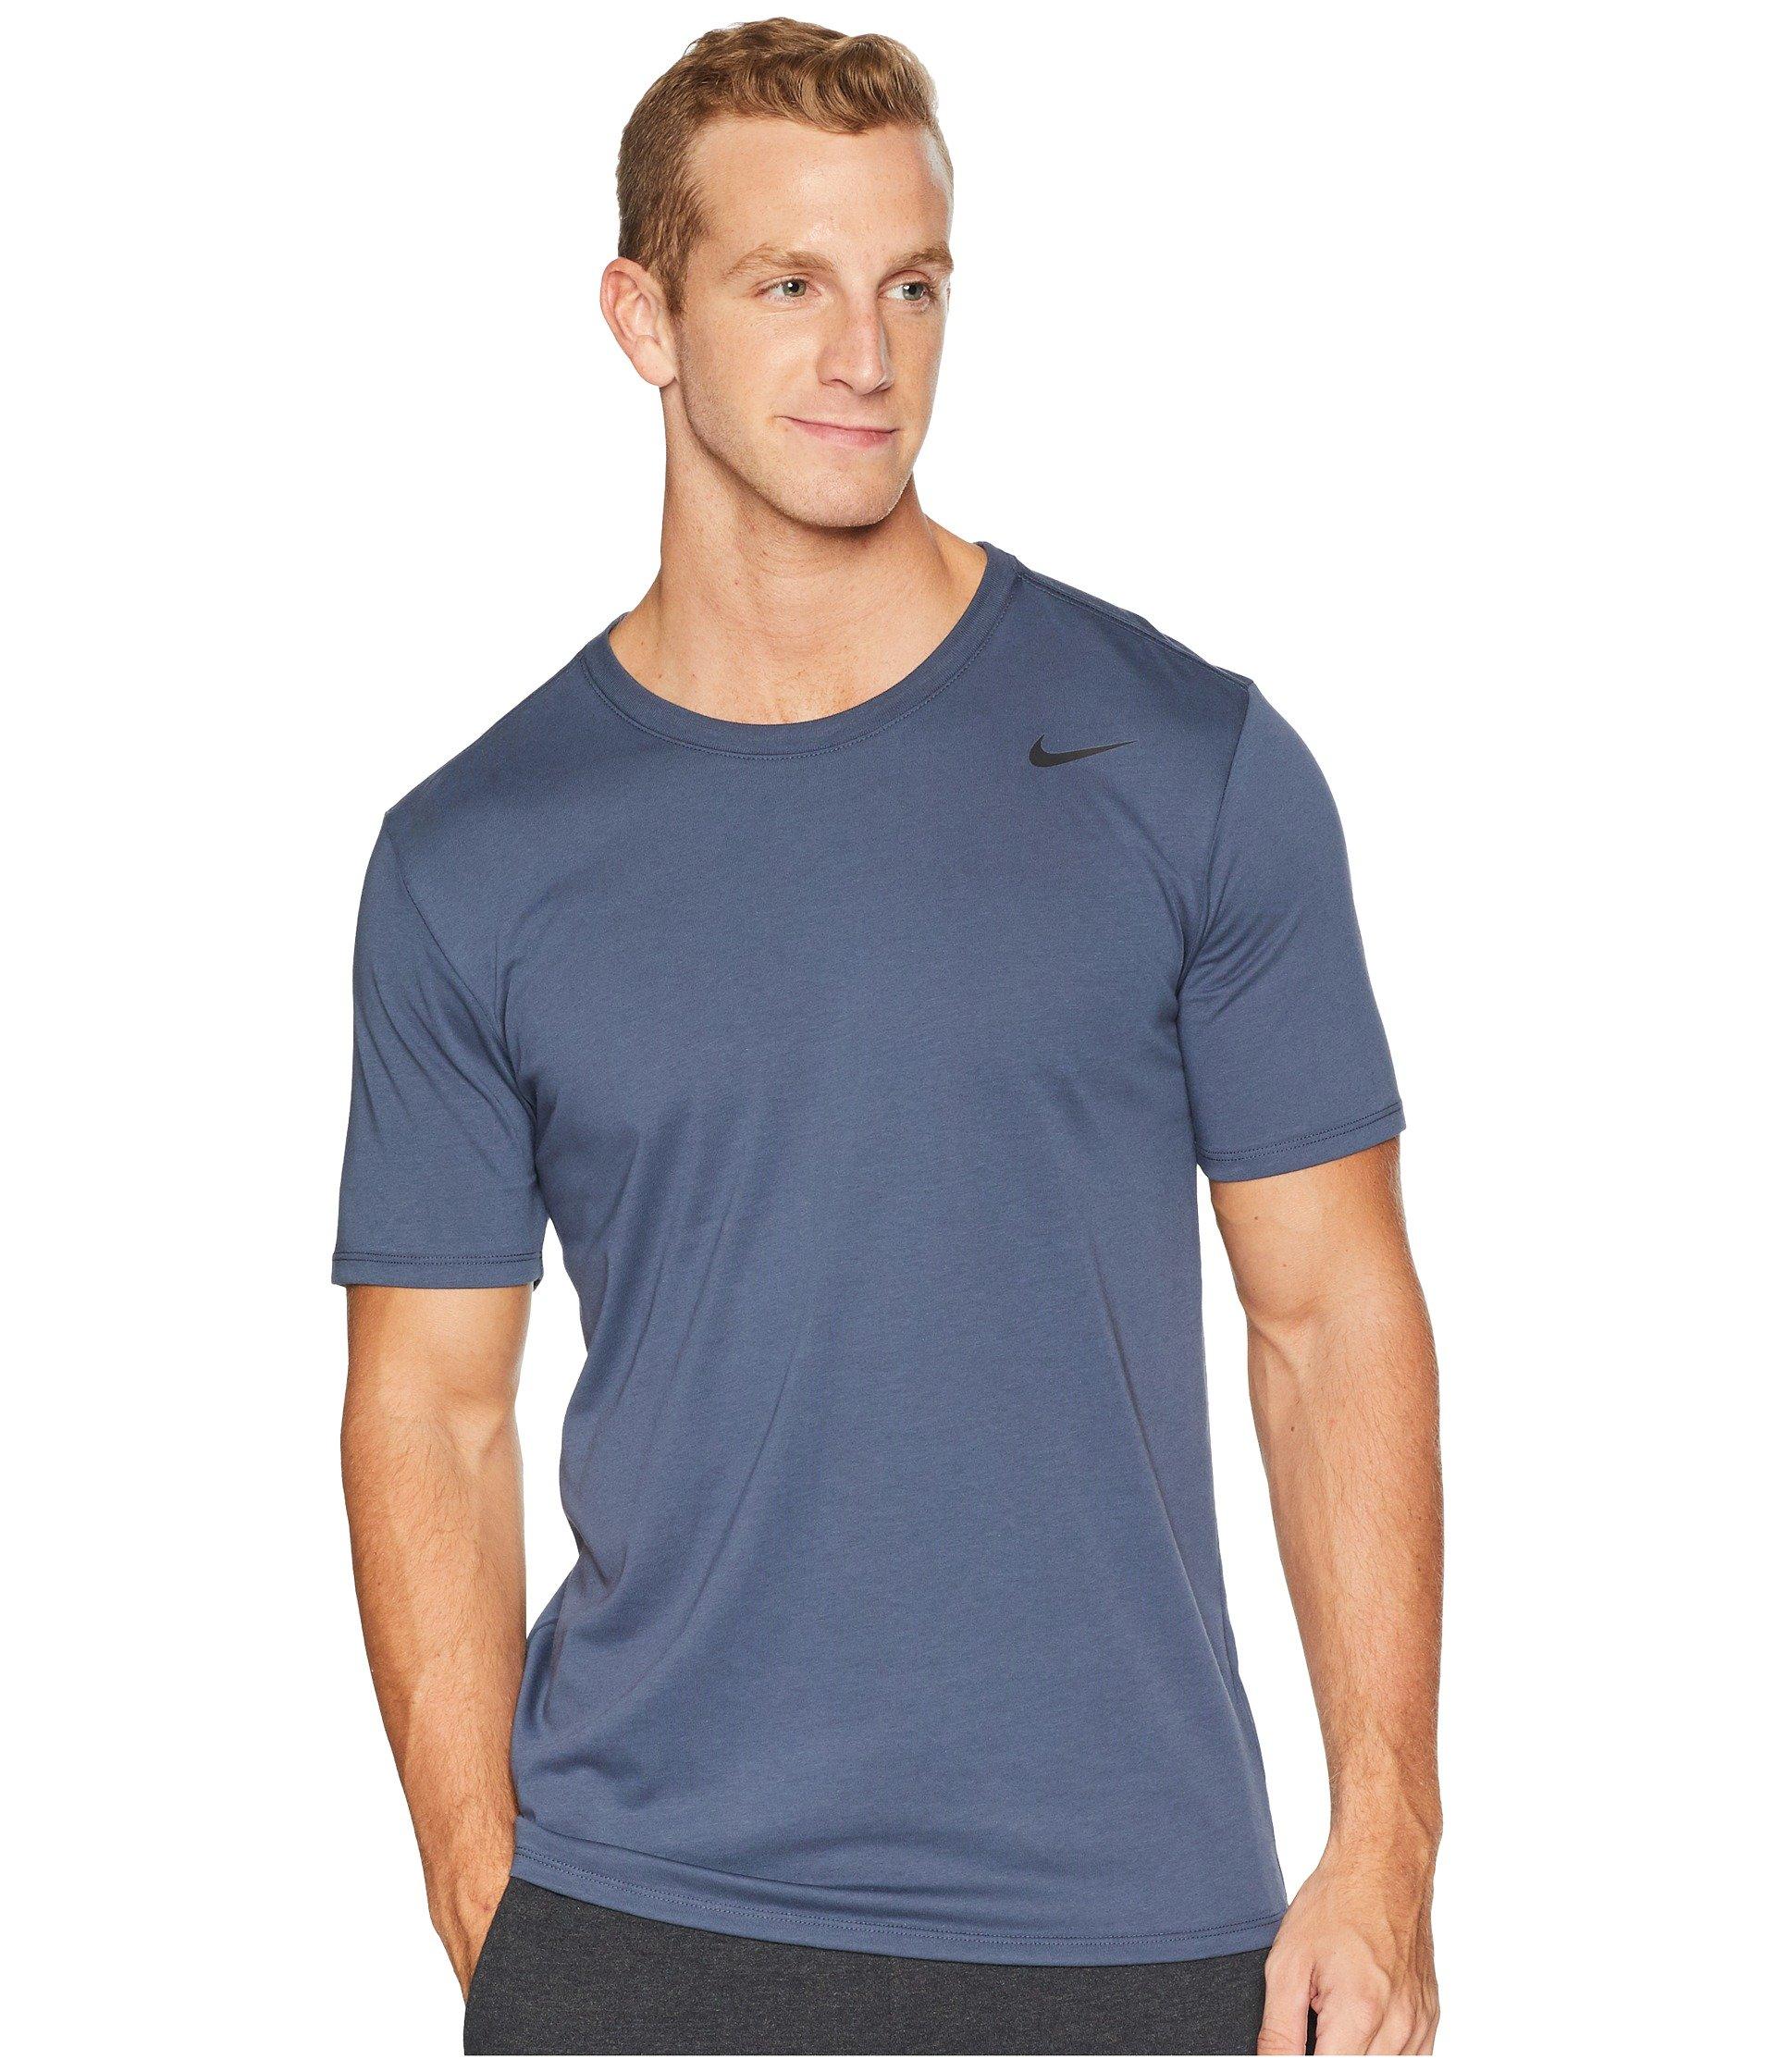 NIKE Men's Dry Training T Shirt Thunder Blue Size Small by NIKE